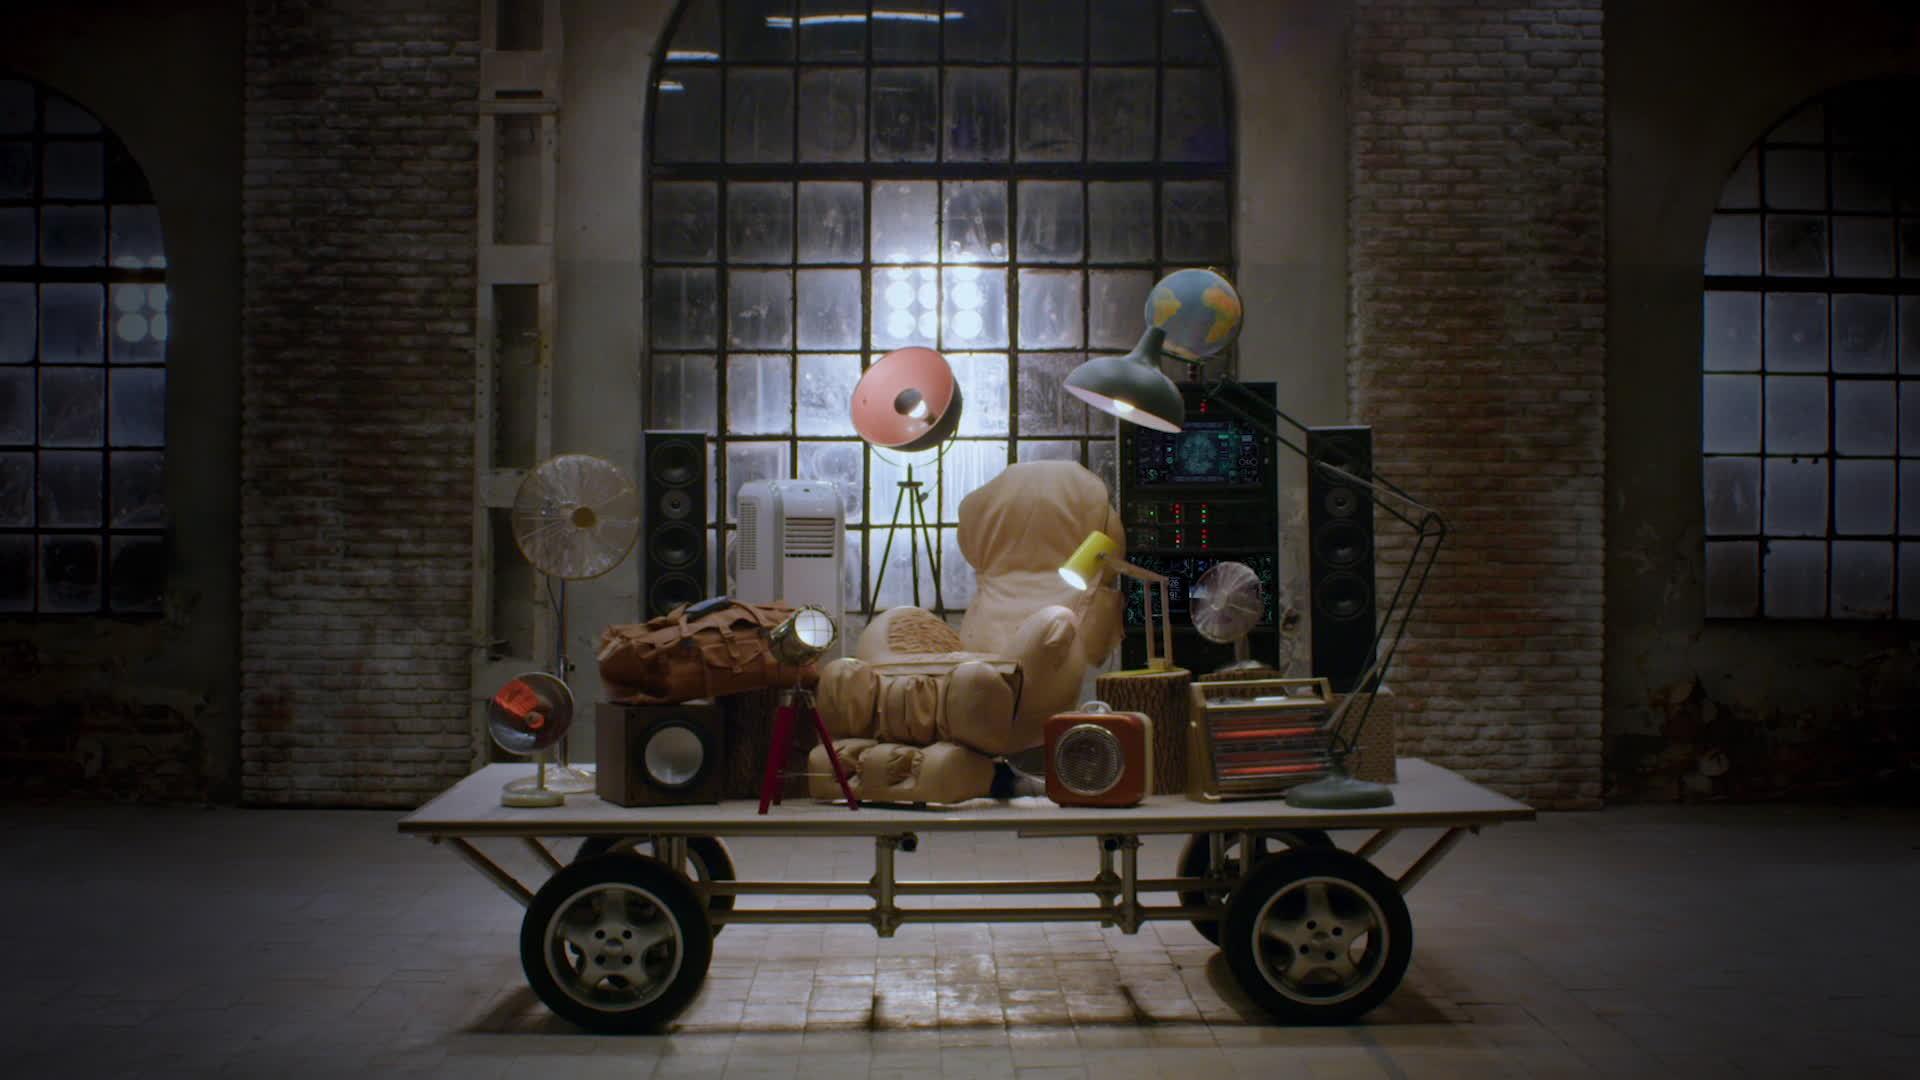 Audi A6 film contest: Reveal